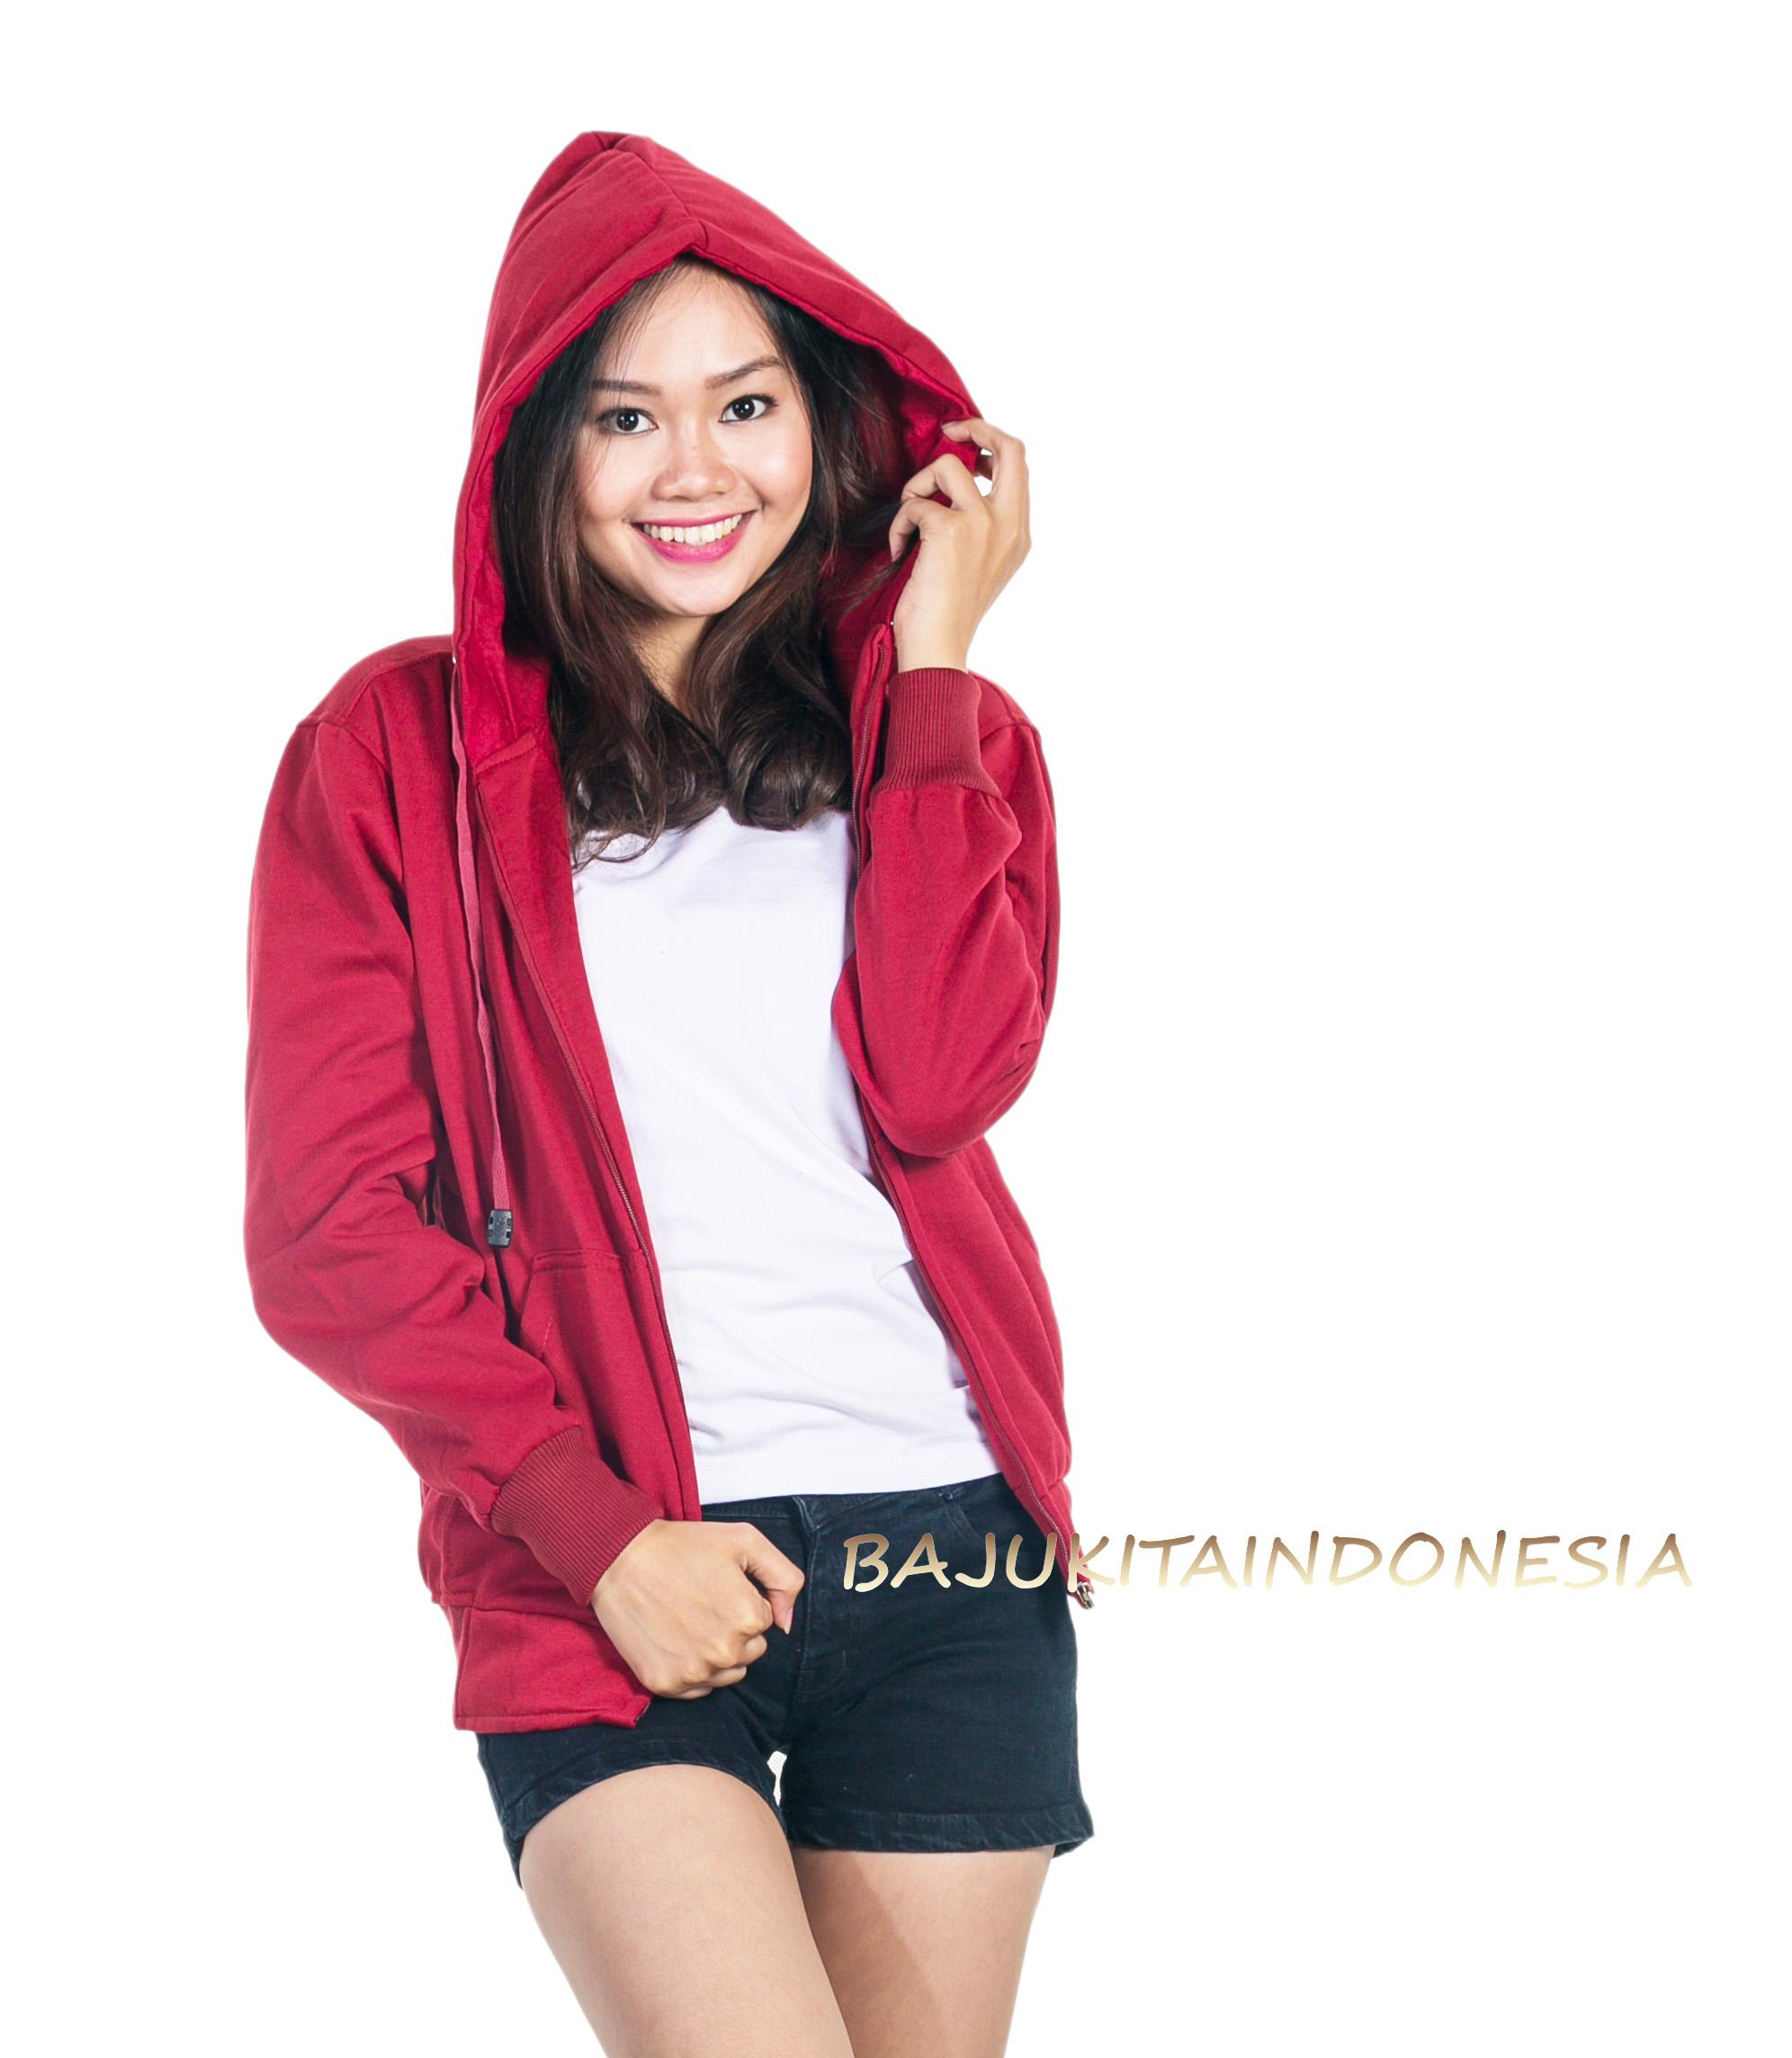 Buy Best Seller Jacket Hoodie Zipper Unisex M Xl Deals For Only Jaket Sweater Anak Laki Rp67250 Instead Of Rp150000